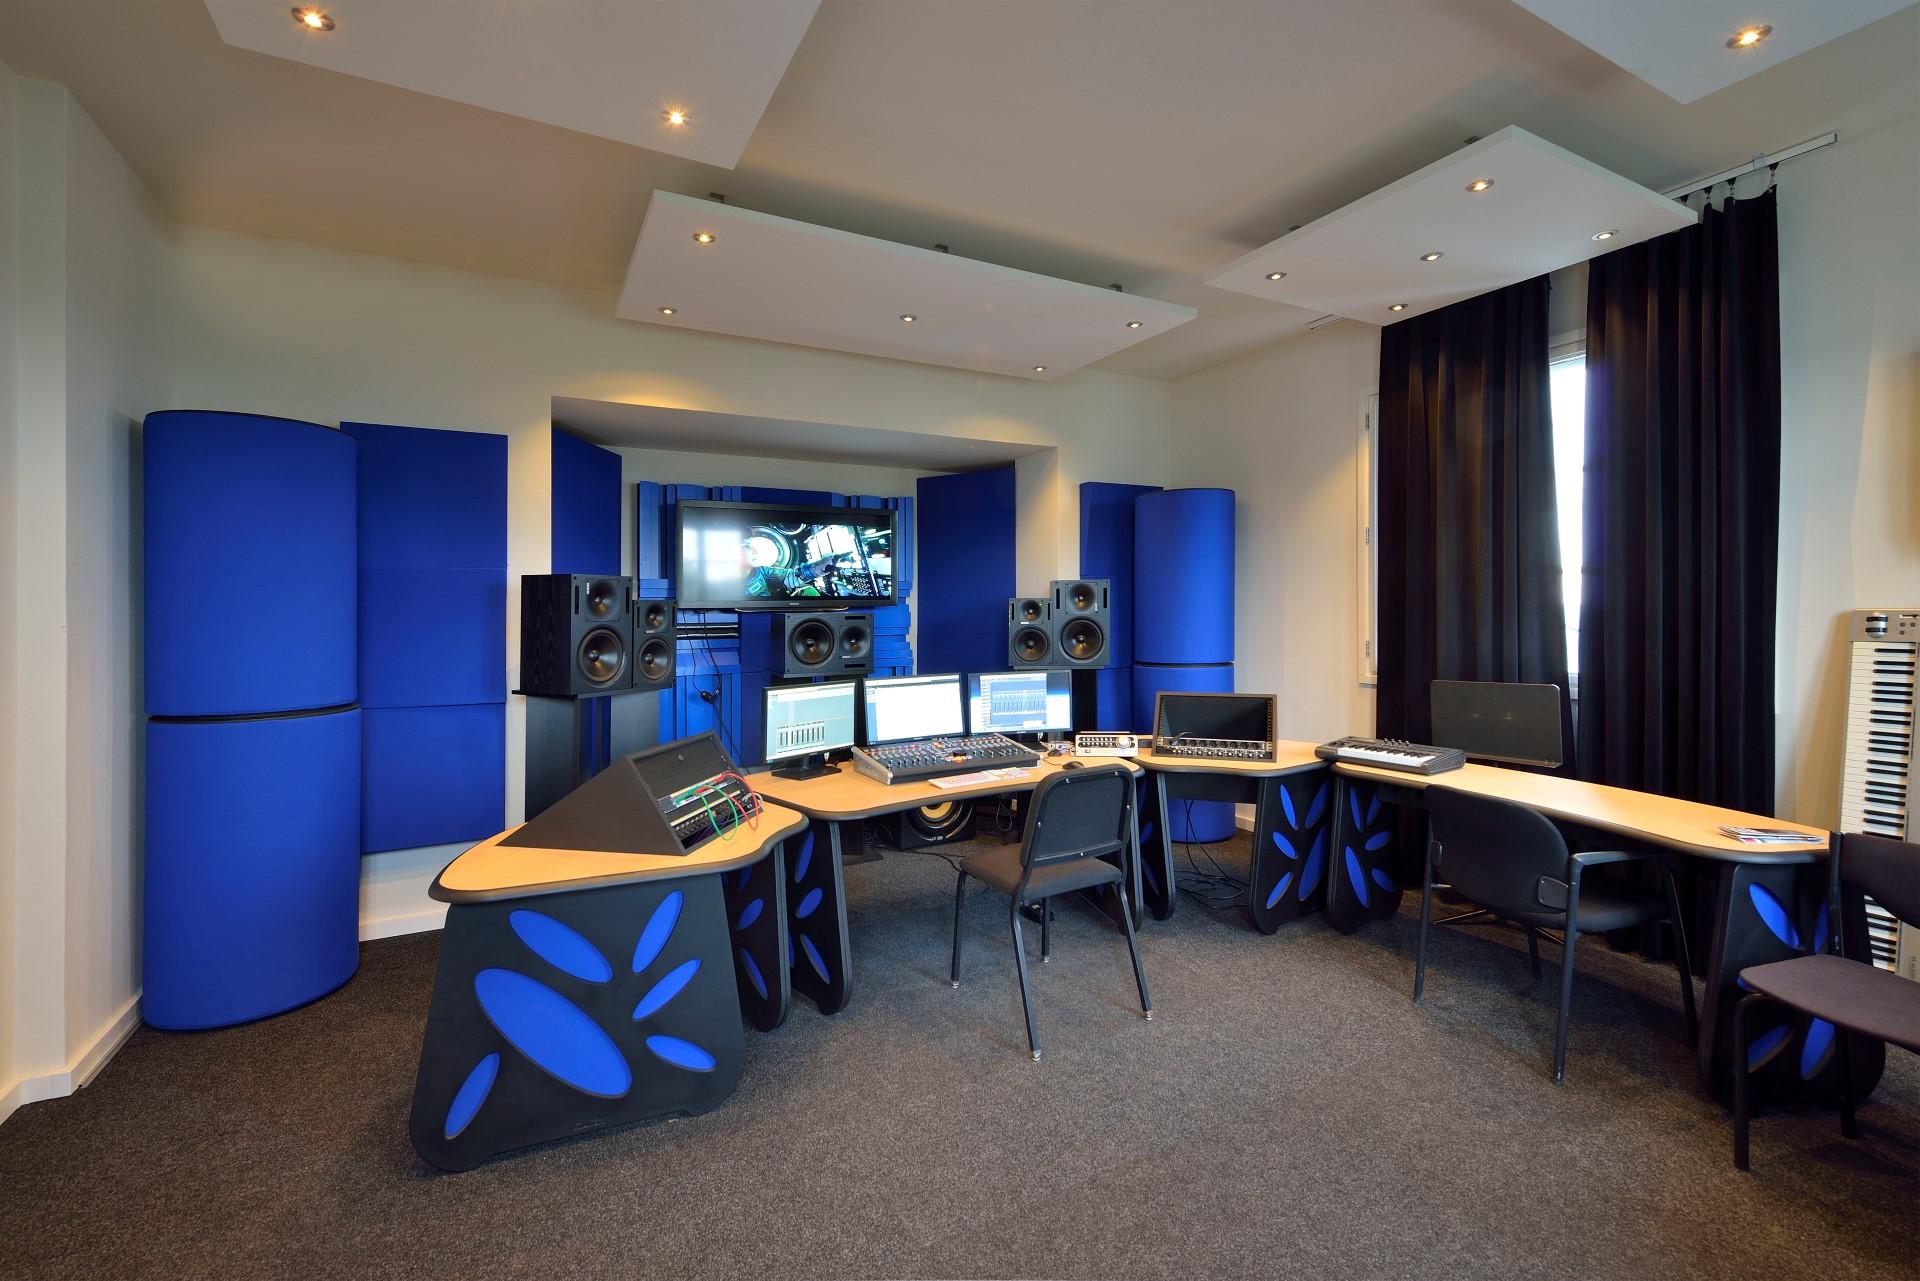 Conservatorium ArtEZ Arnhem studiobouw regieruimte en liveroom